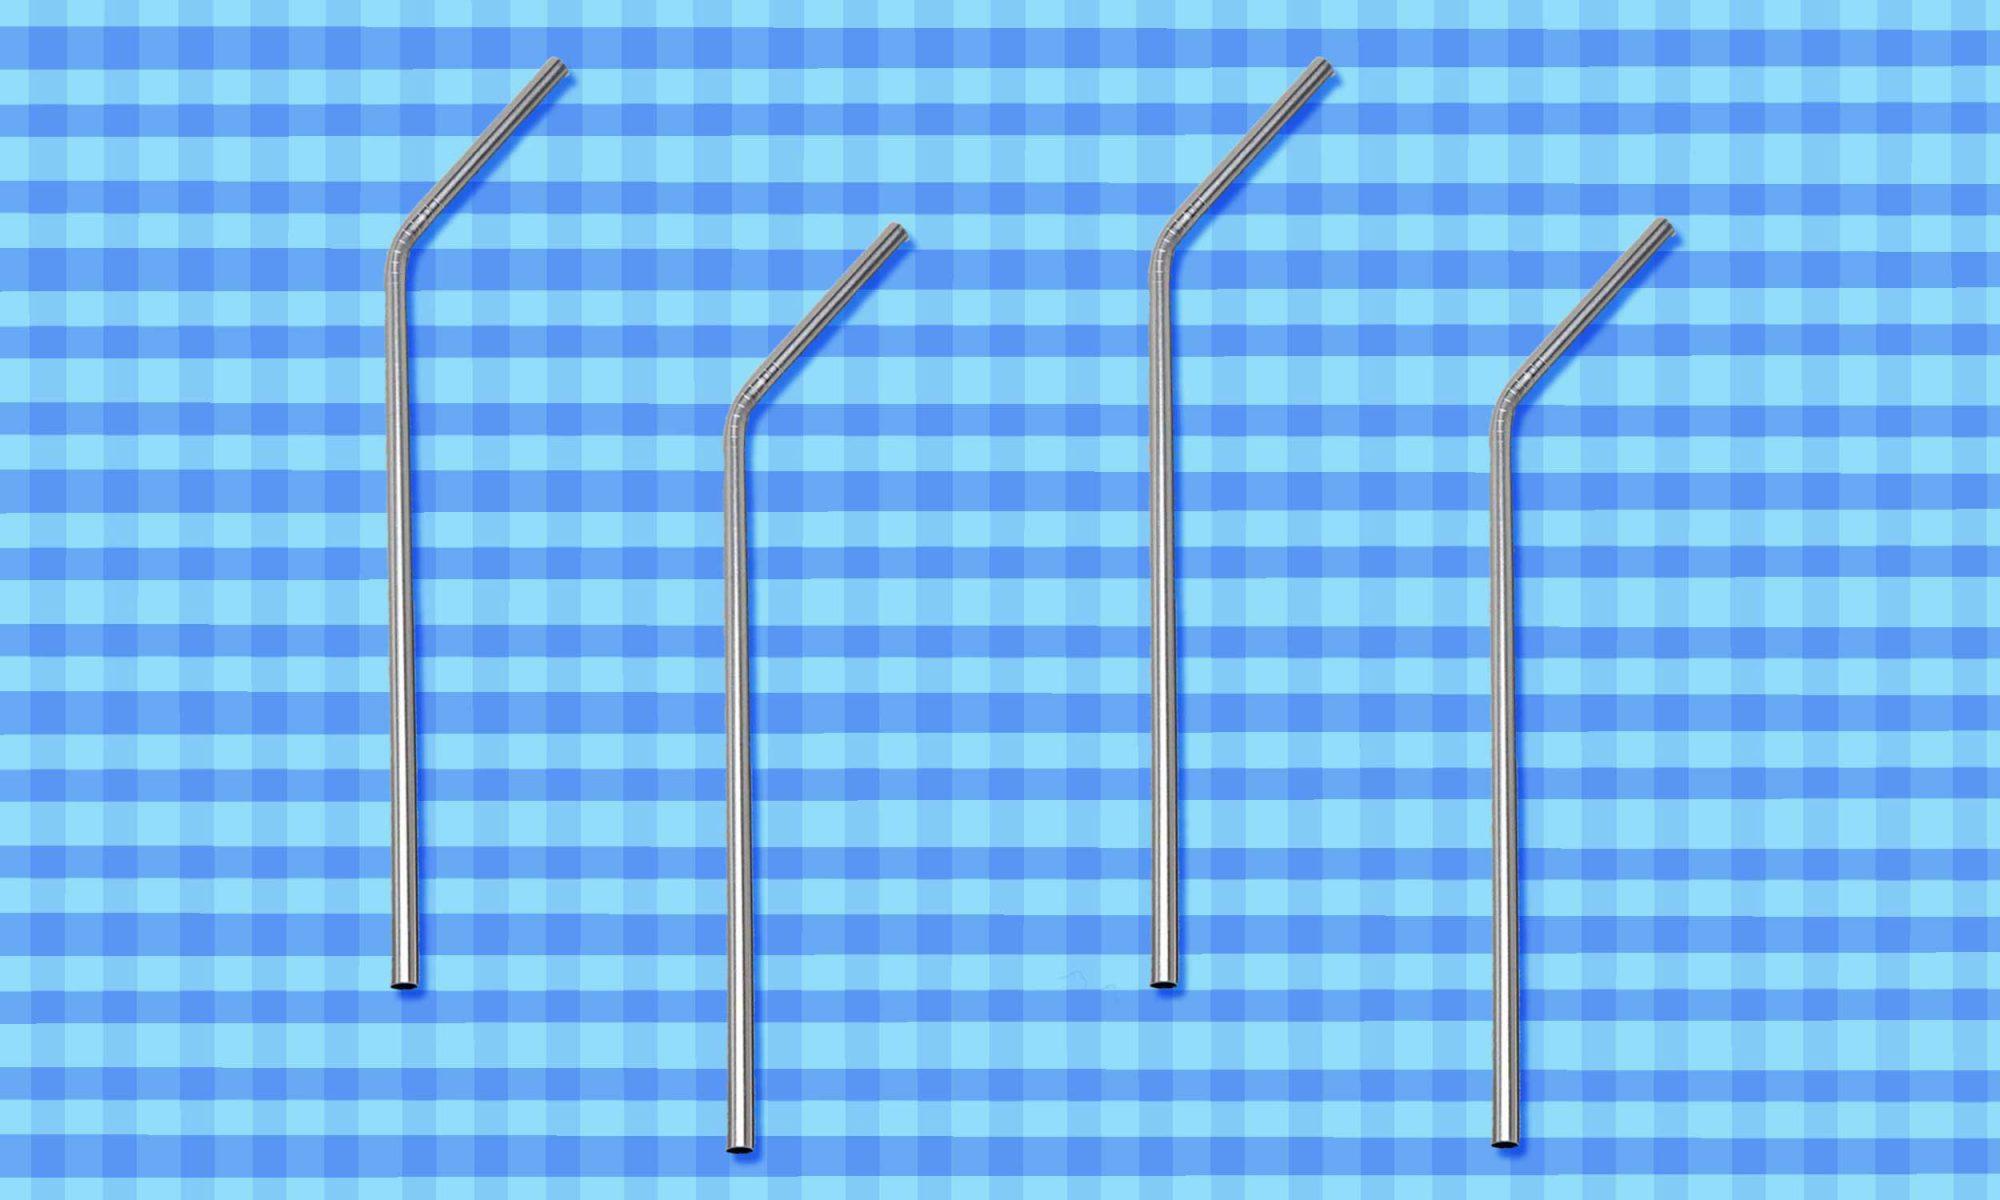 EC: Metal Straws Make Every Drink Taste Better